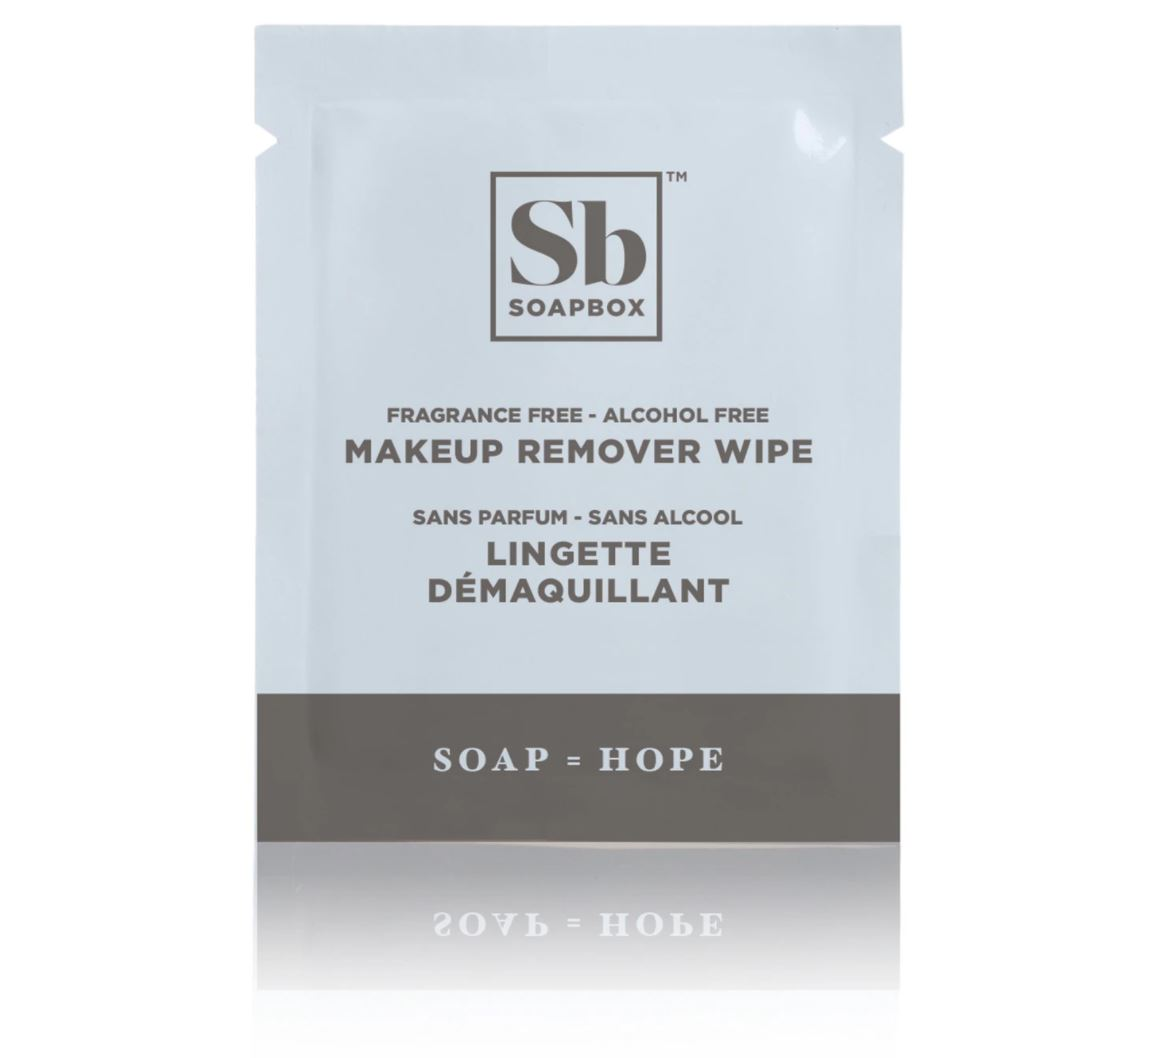 SoapBox Makeup Remover Wipe